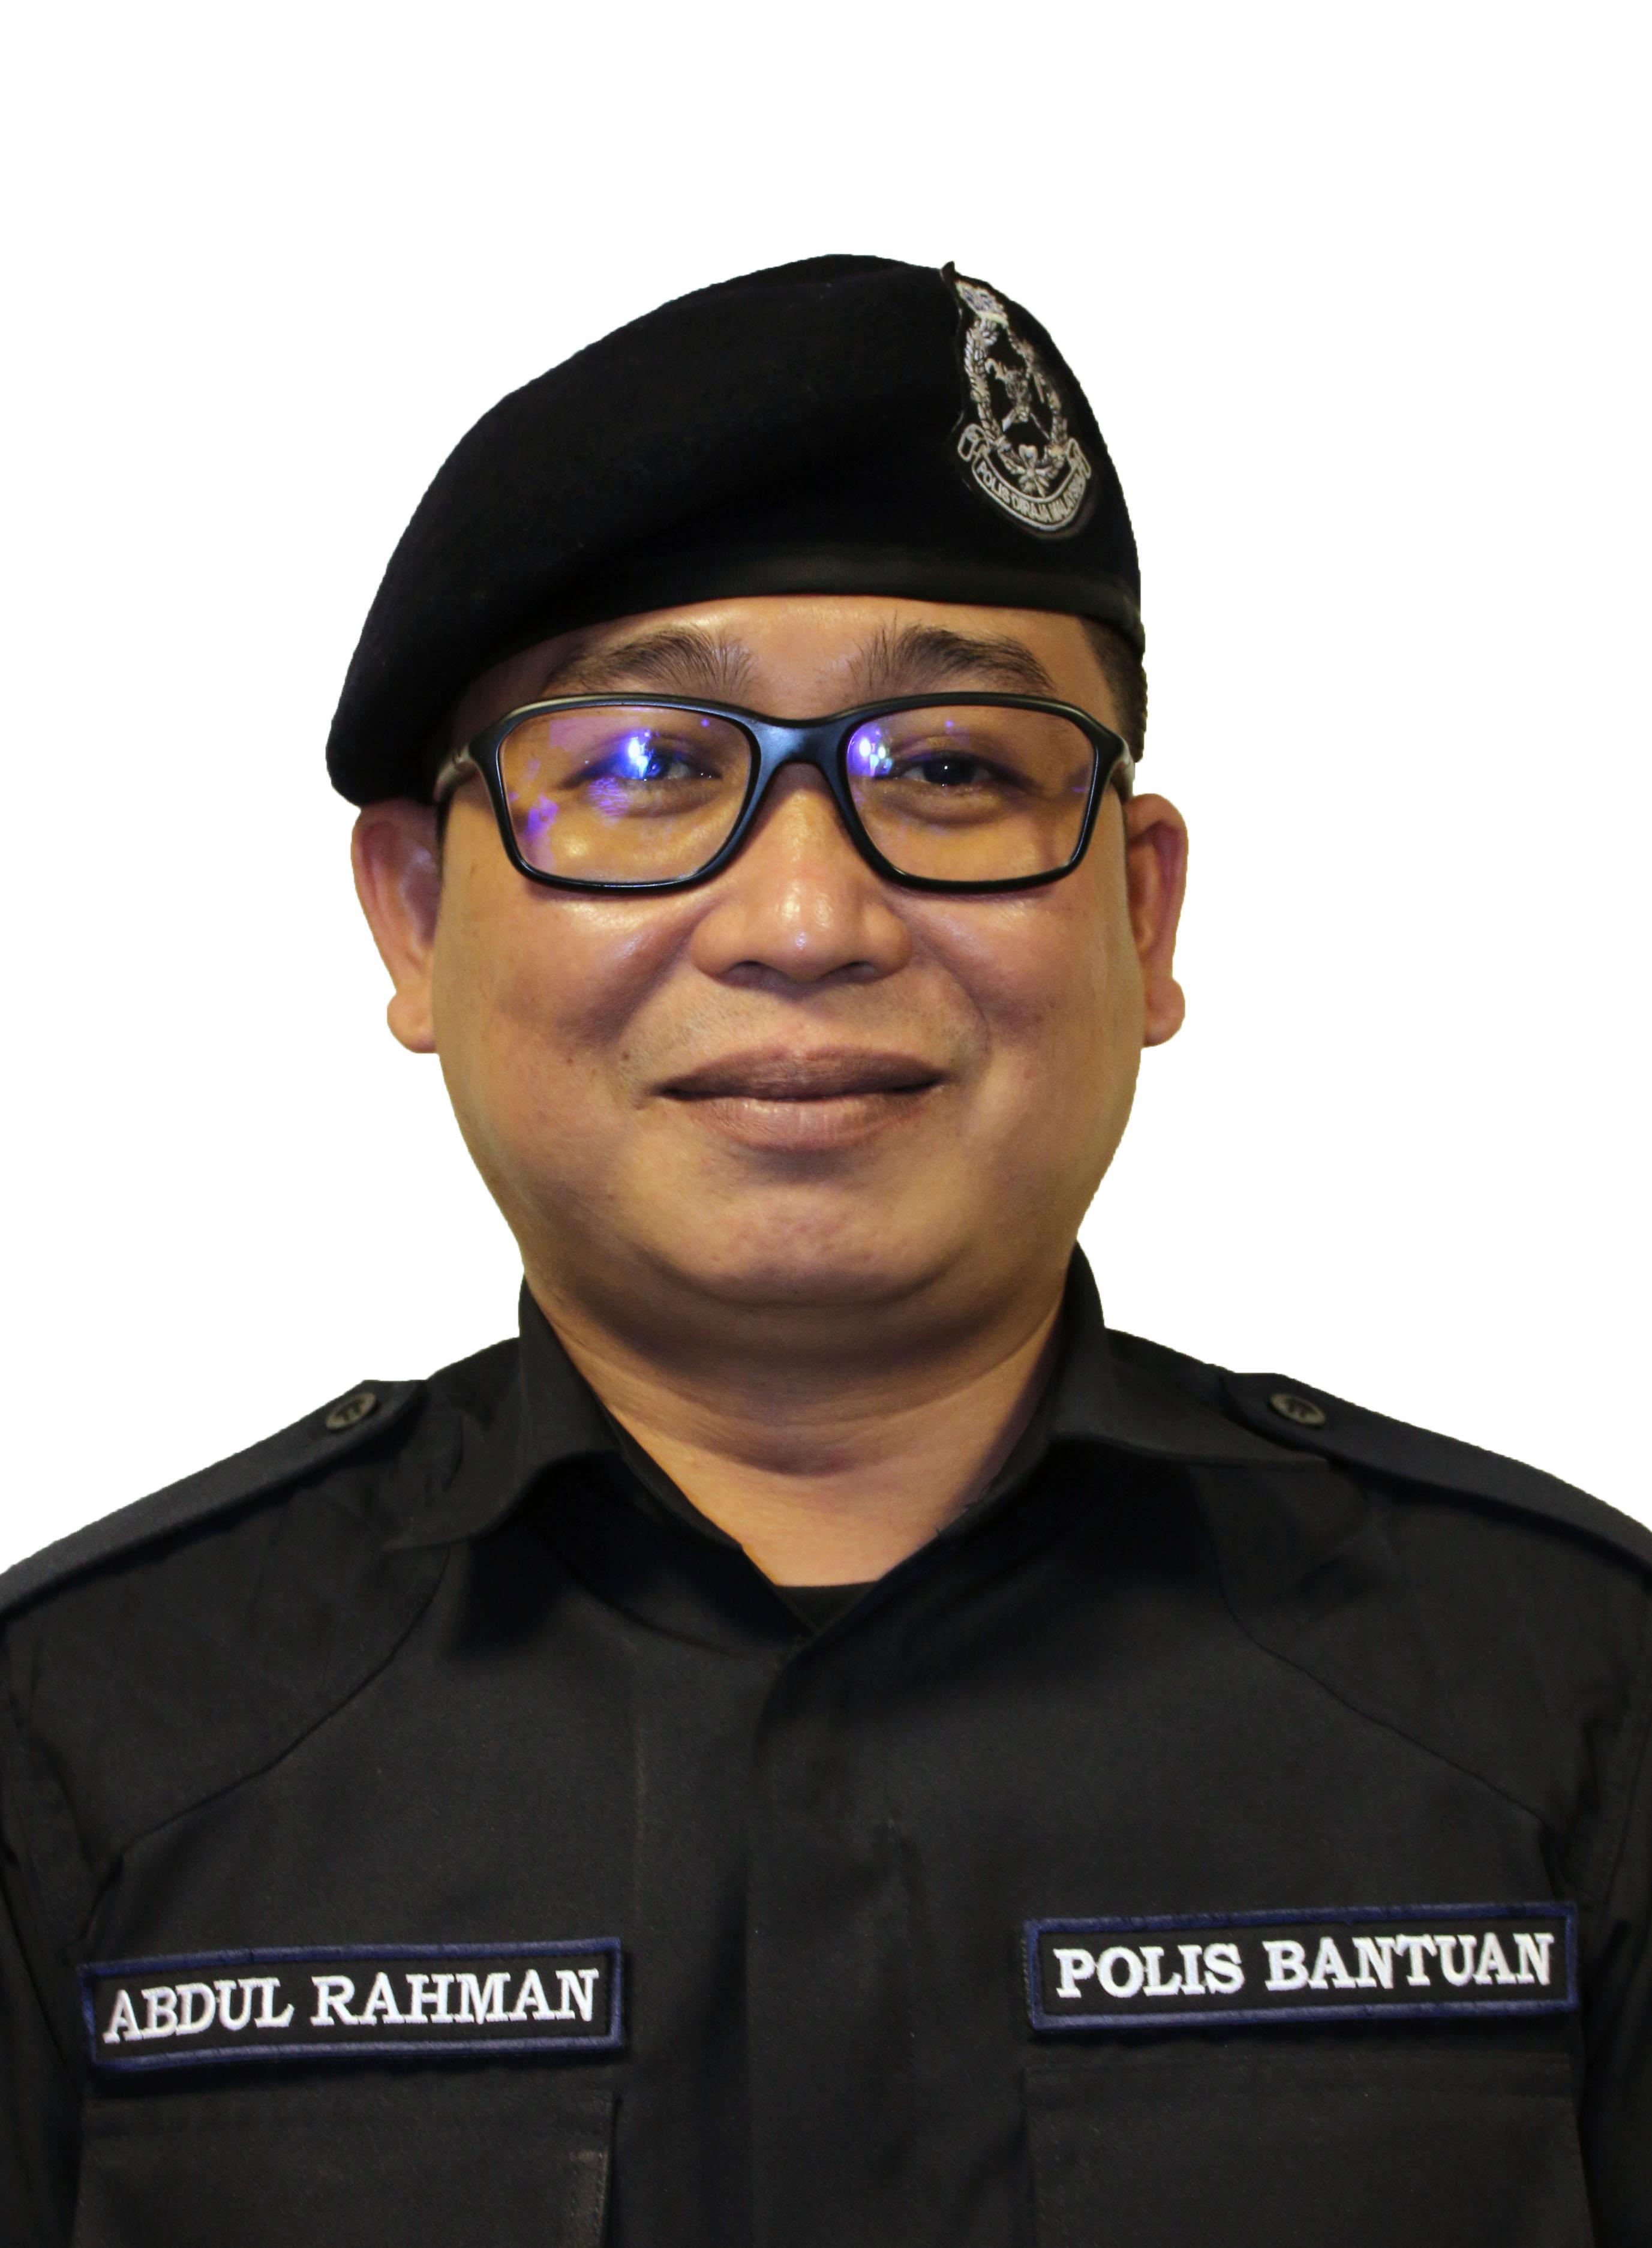 Cpl. Abdul Rahman Bin Mohd Salleh